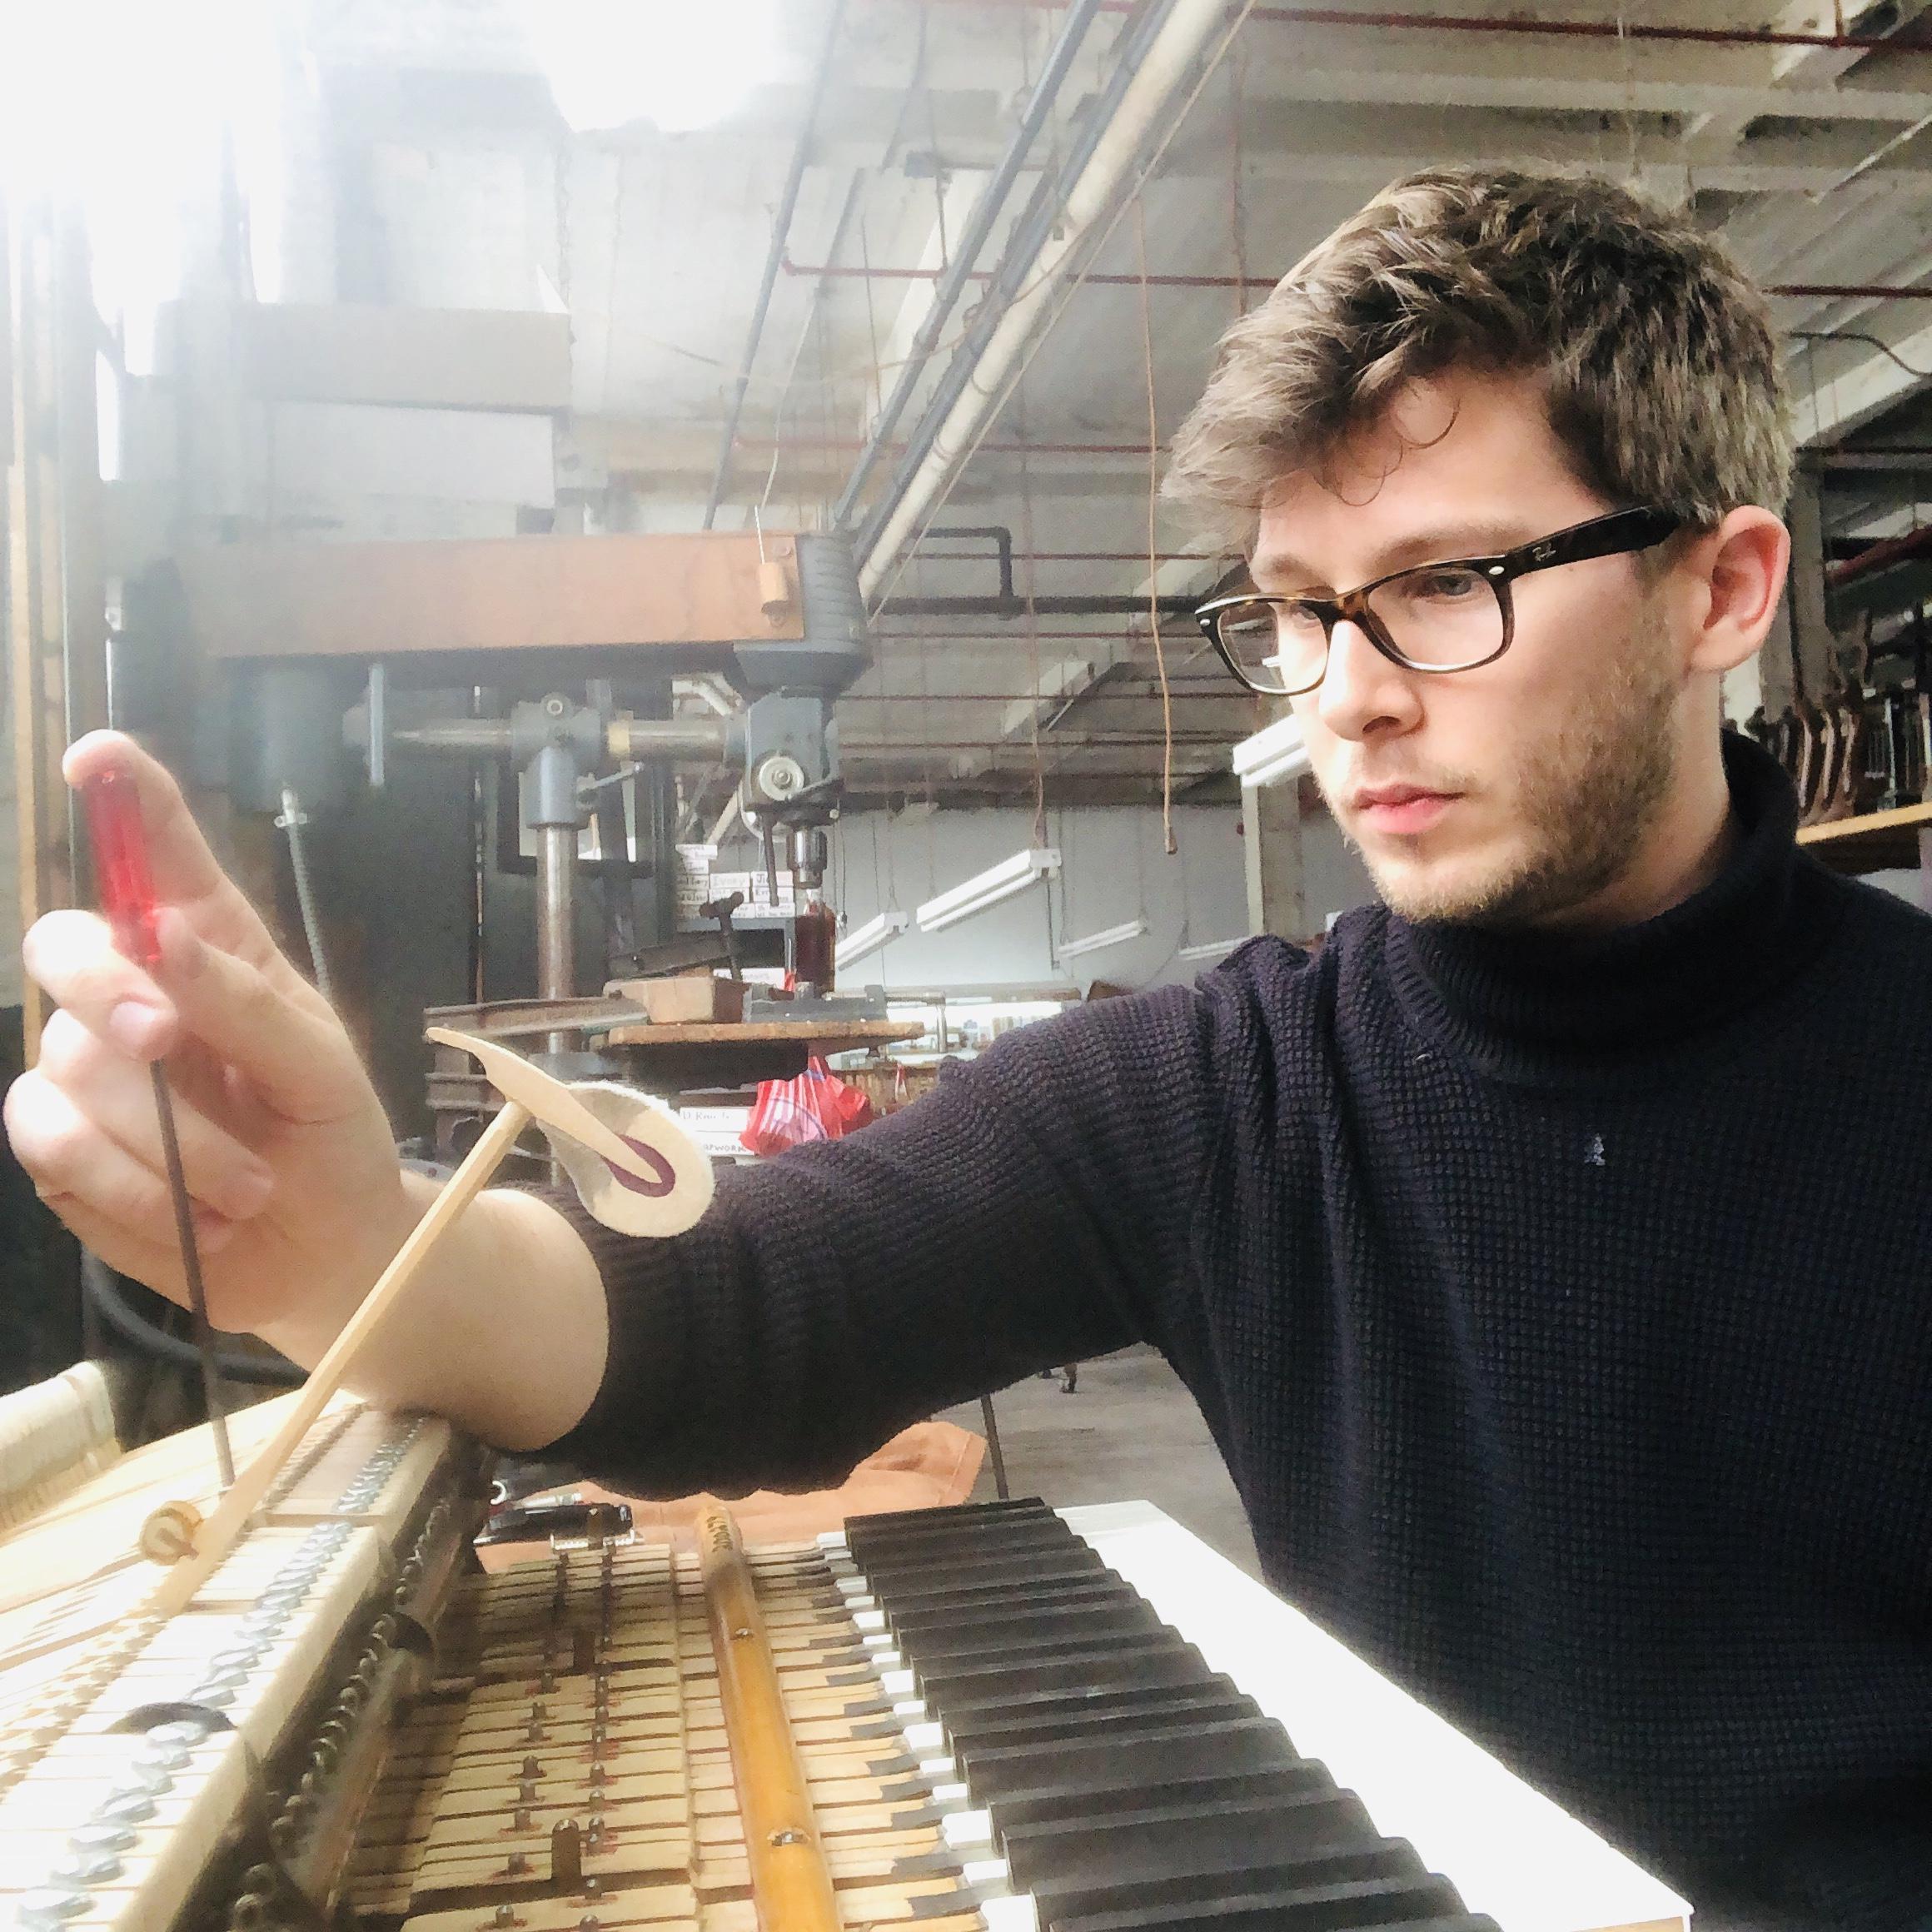 Gon Halevi New York City Piano Tuner.jpg